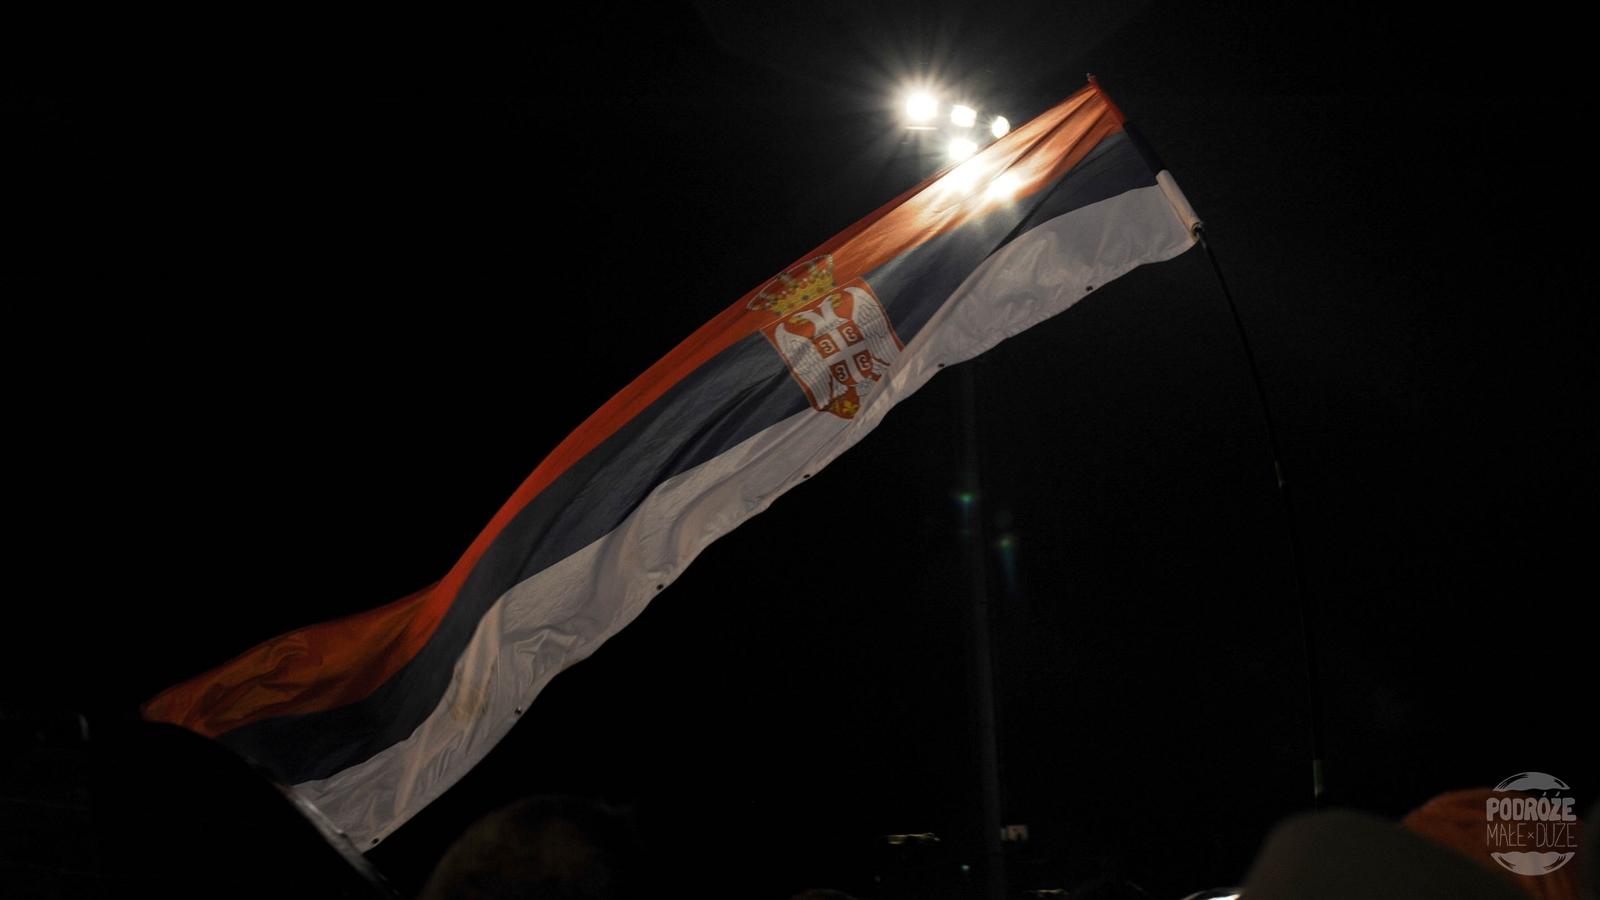 Serbia festiwal trąb w Guca koncert na stadionie flaga